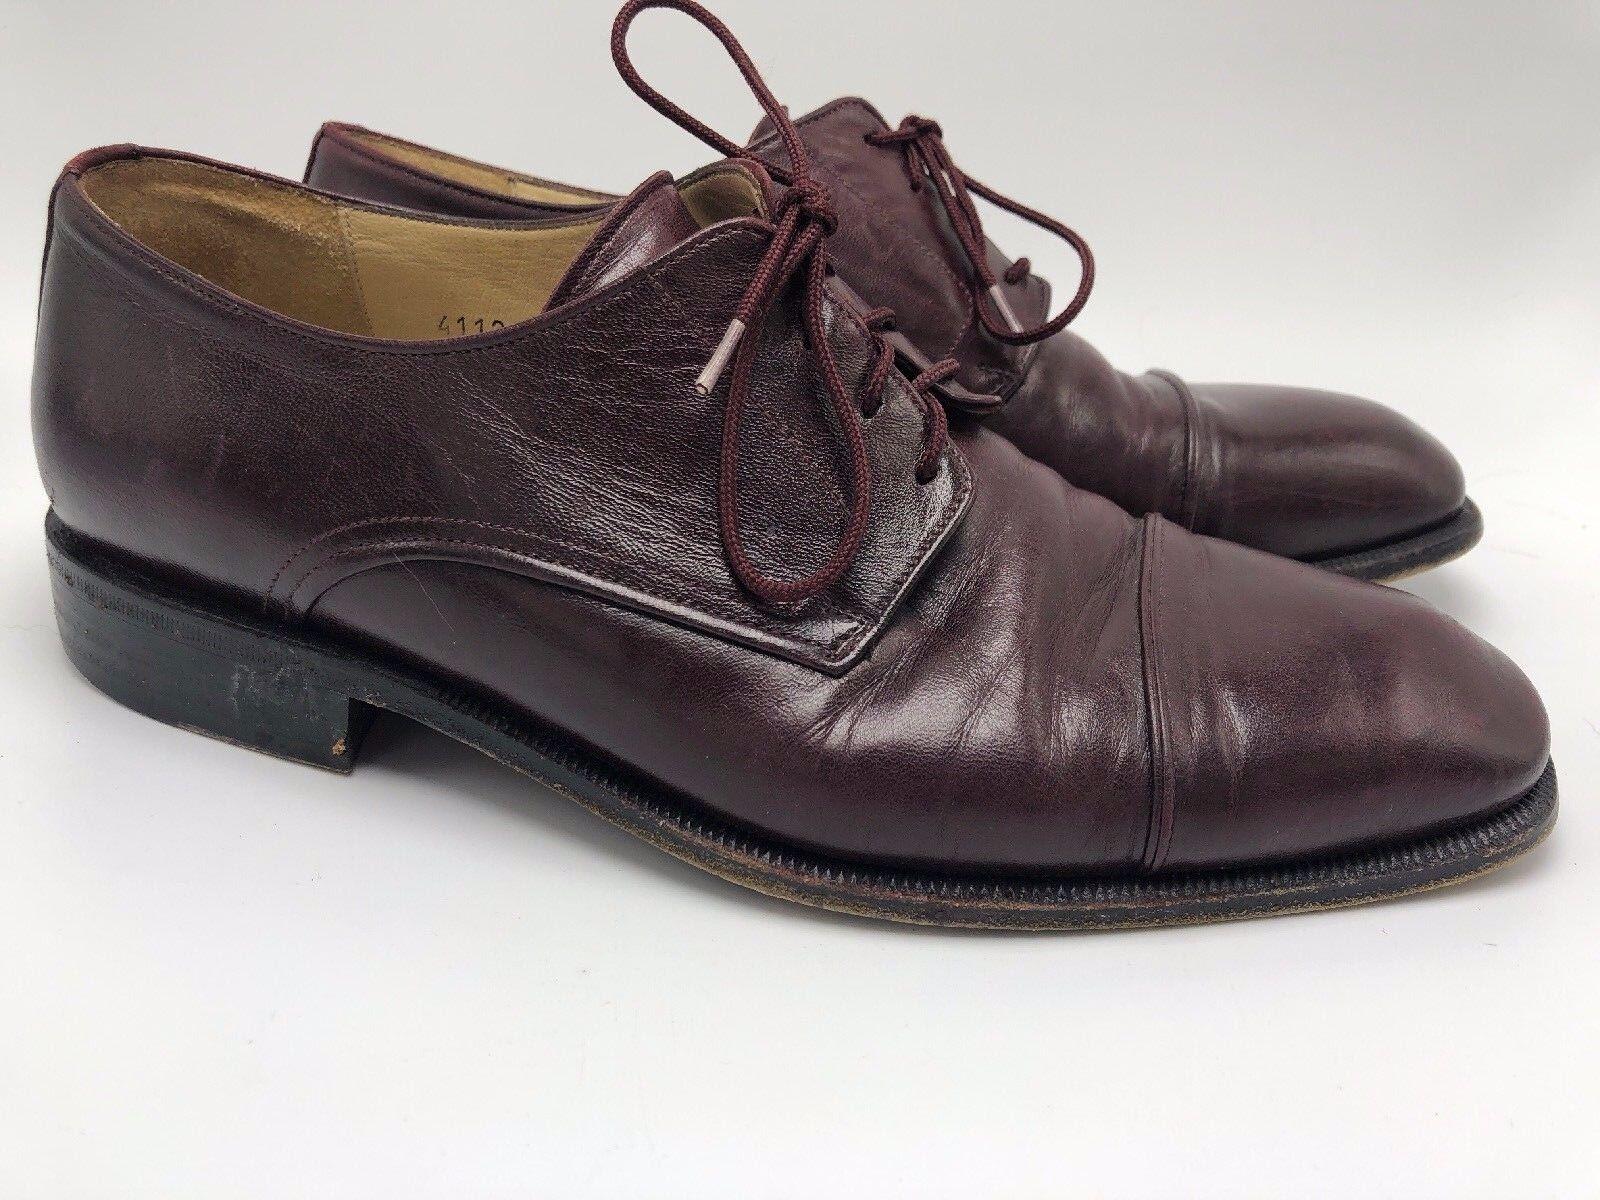 PRINCIPE ITALY Burgundy Soft Italian Leather Cap Toe Oxfords 9 D - Oxblood Mens